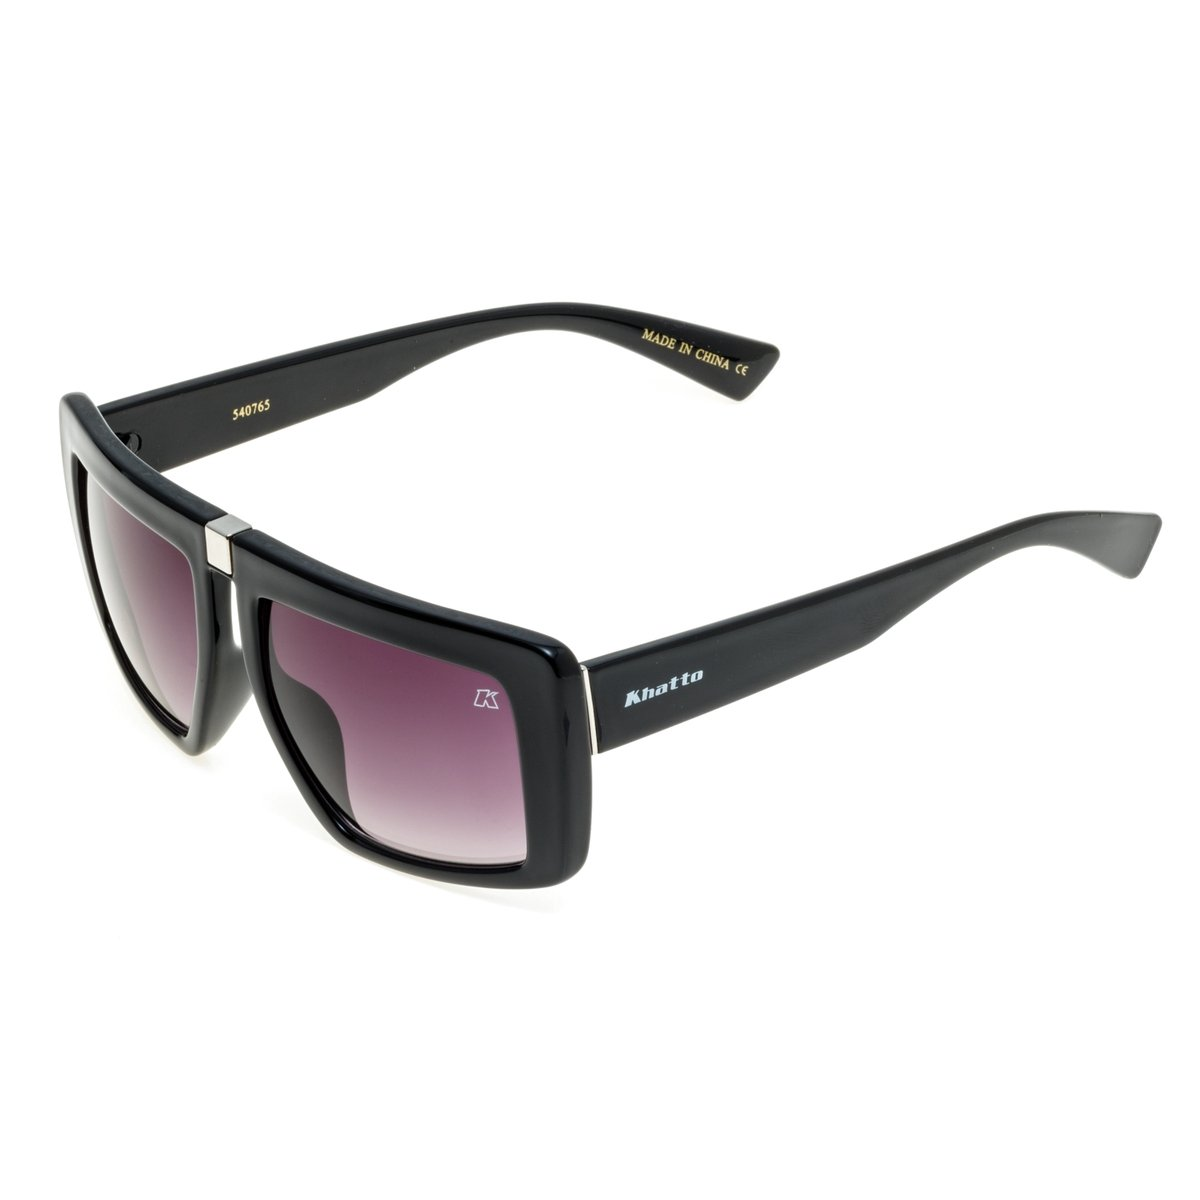 c17e1a8fc36a8 Óculos de Sol Khatto KT540765 - Compre Agora   Netshoes